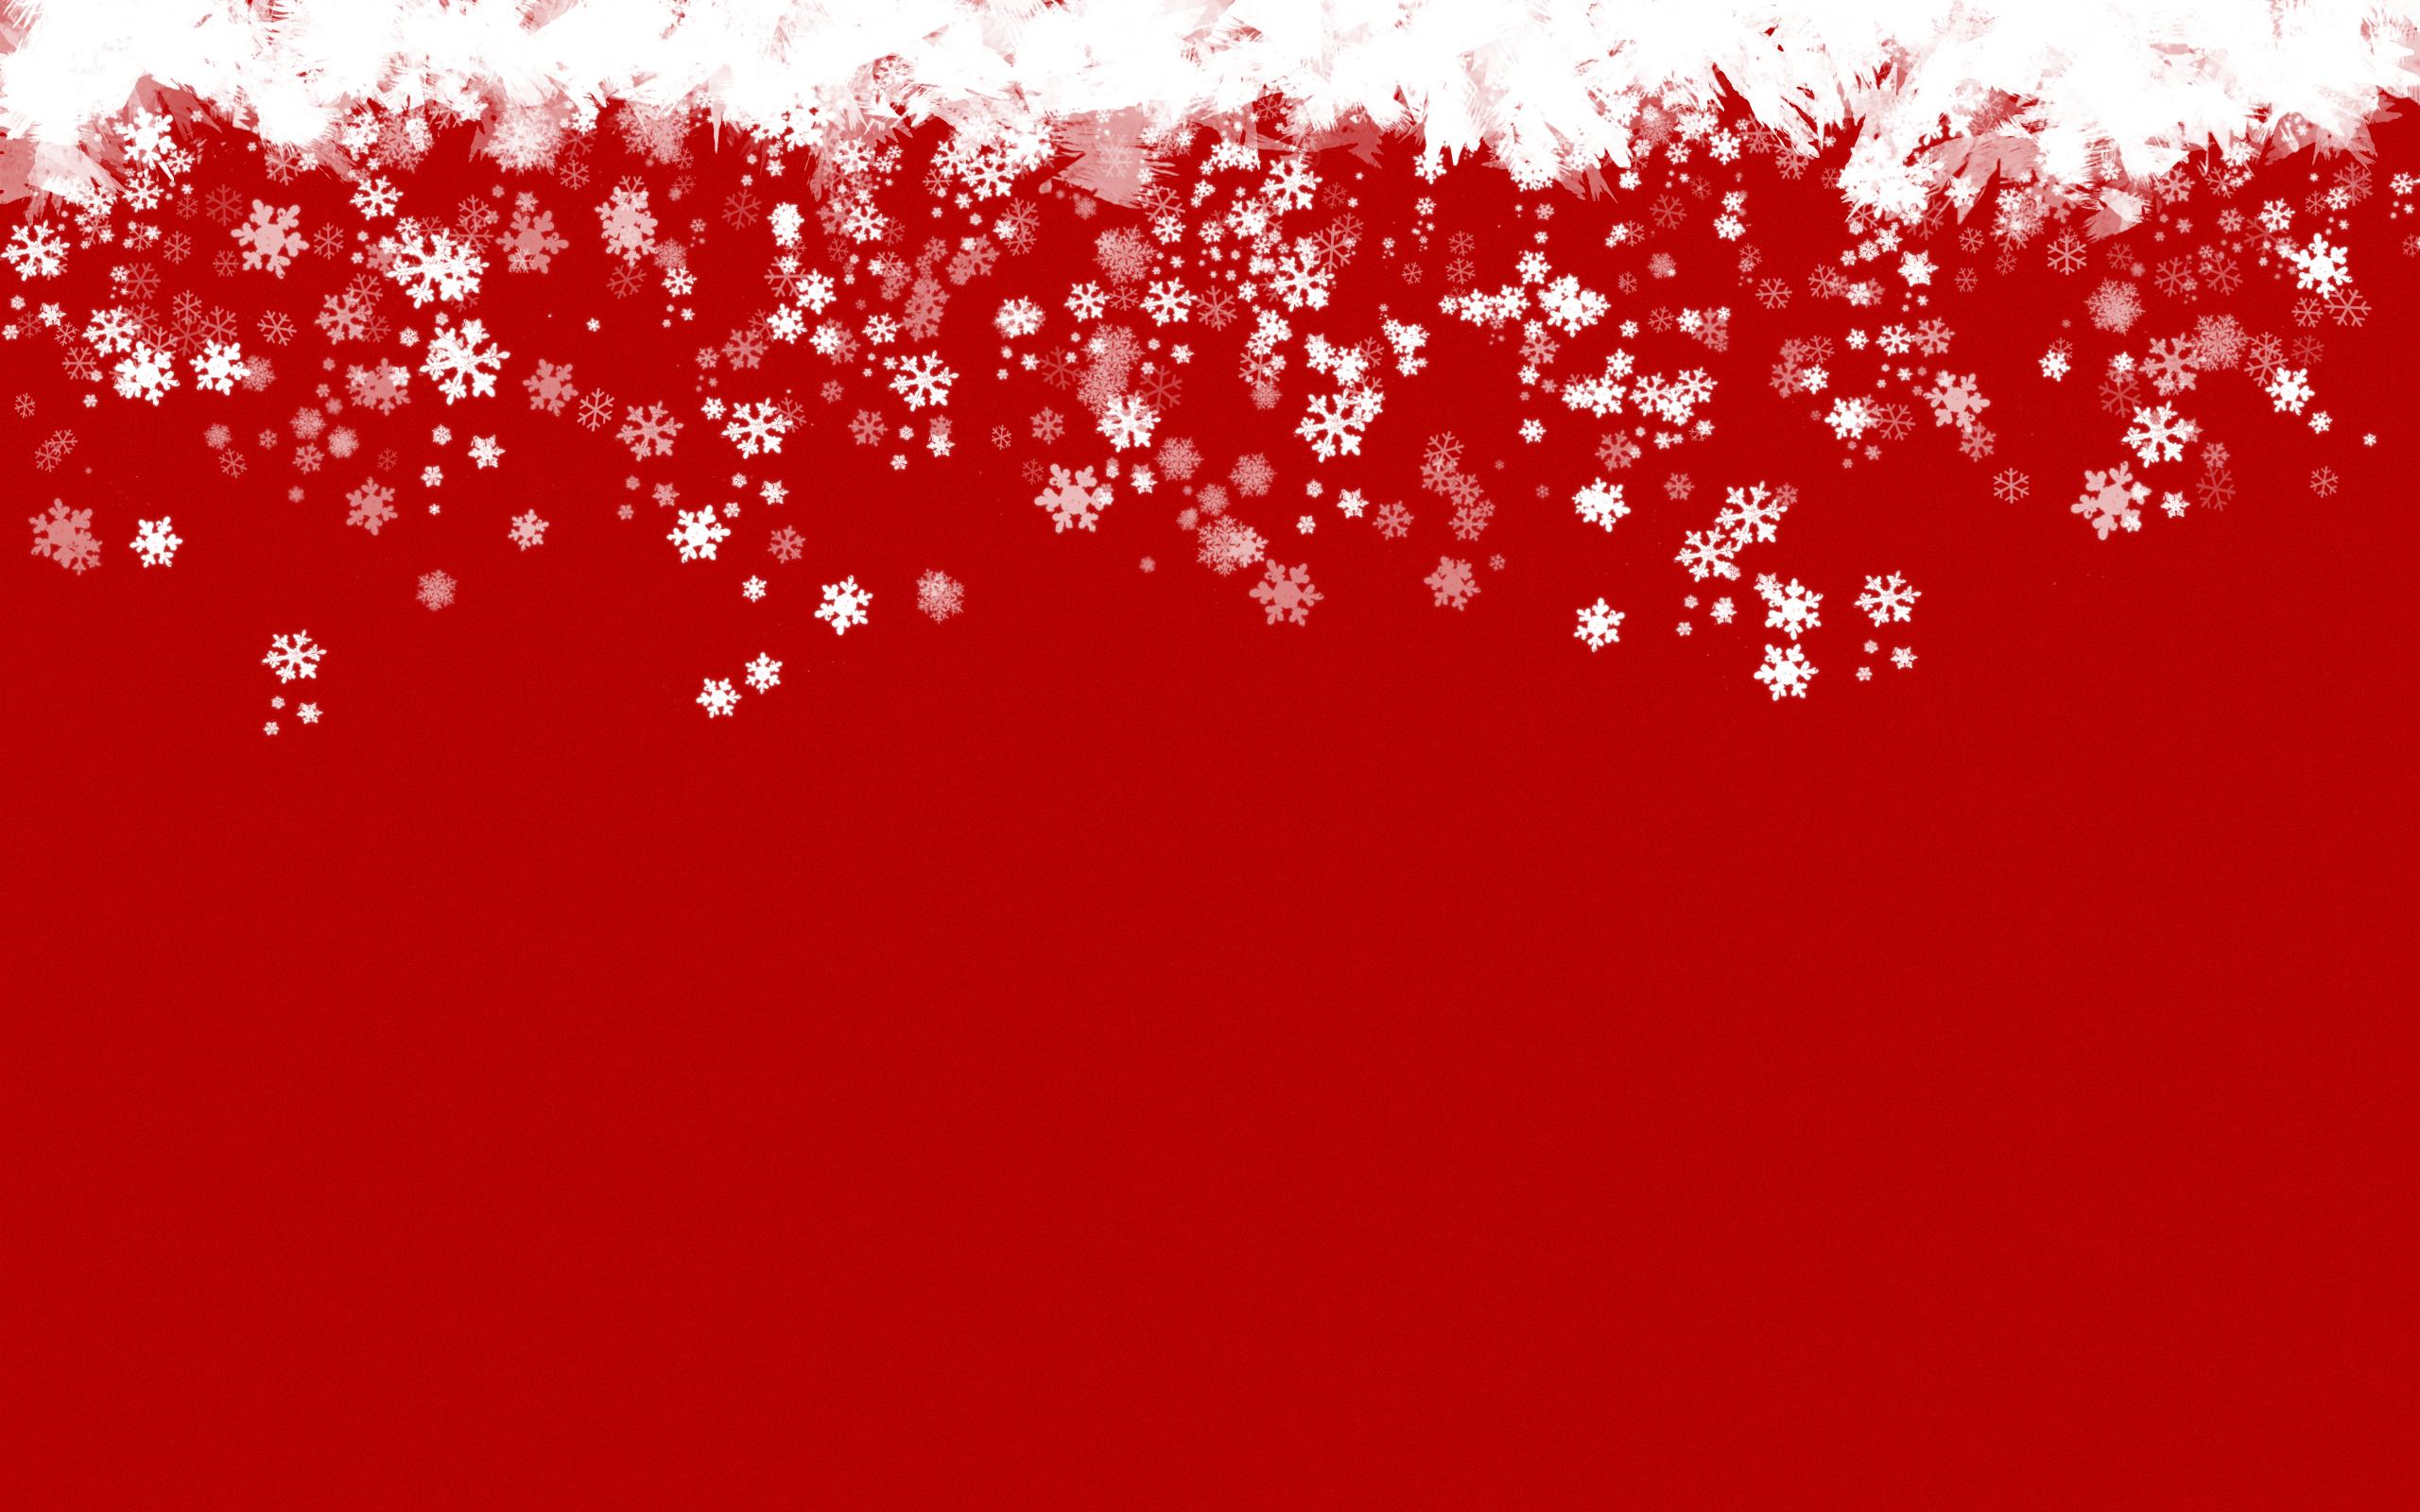 Red Snowflake Wallpaper